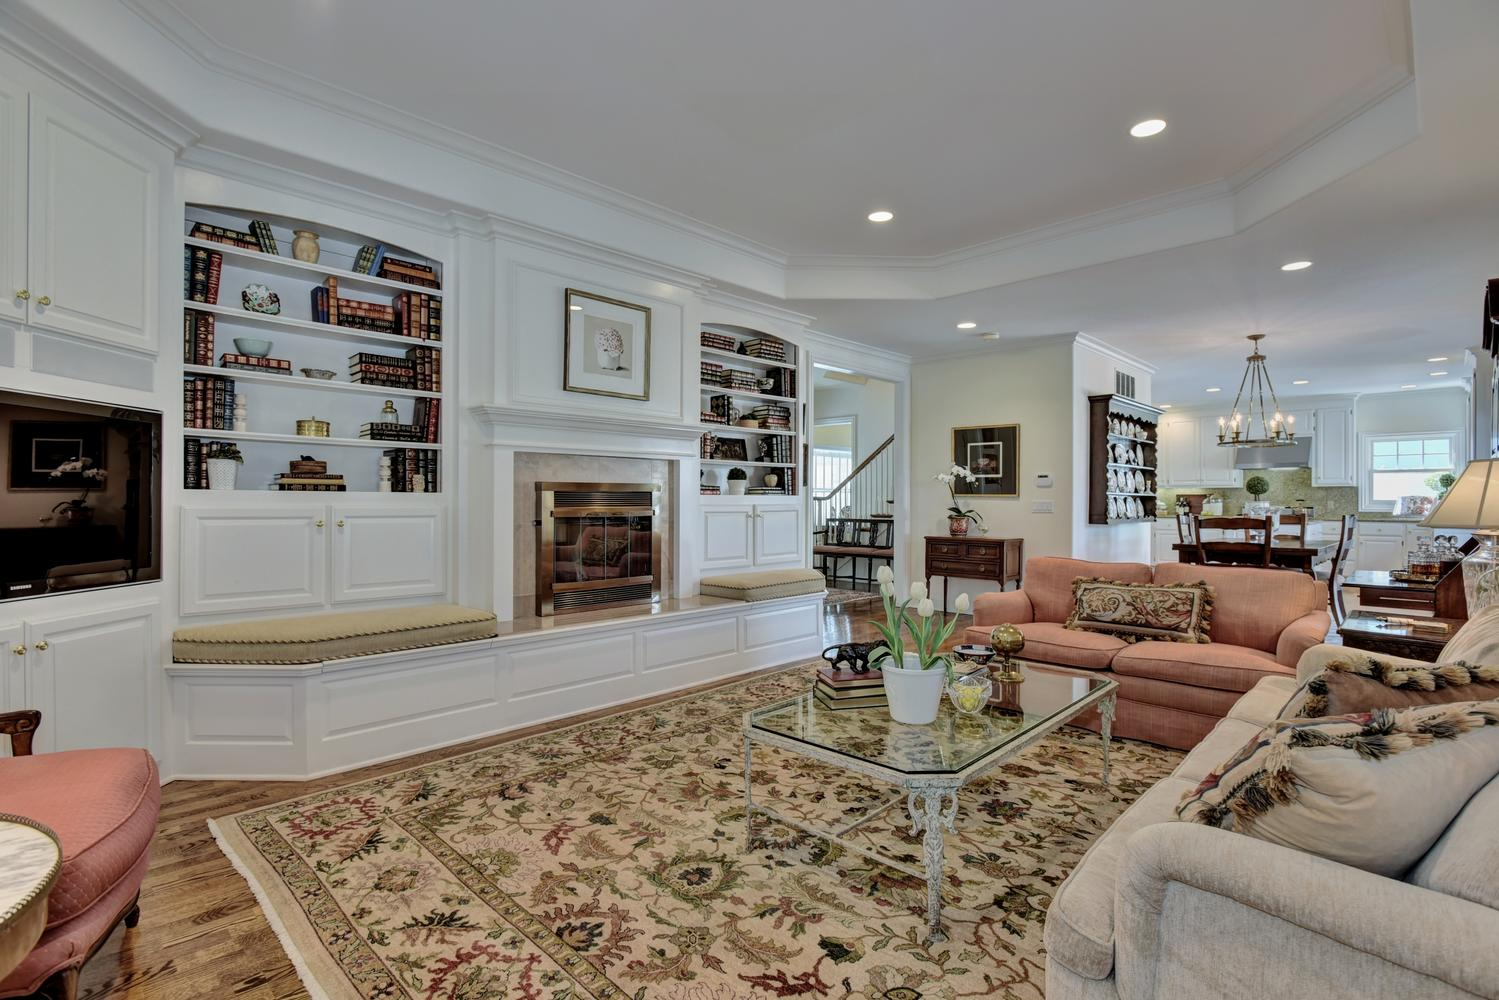 300 W Main St Los Gatos CA-large-012-10-Family Room View-1499x1000-72dpi.jpg